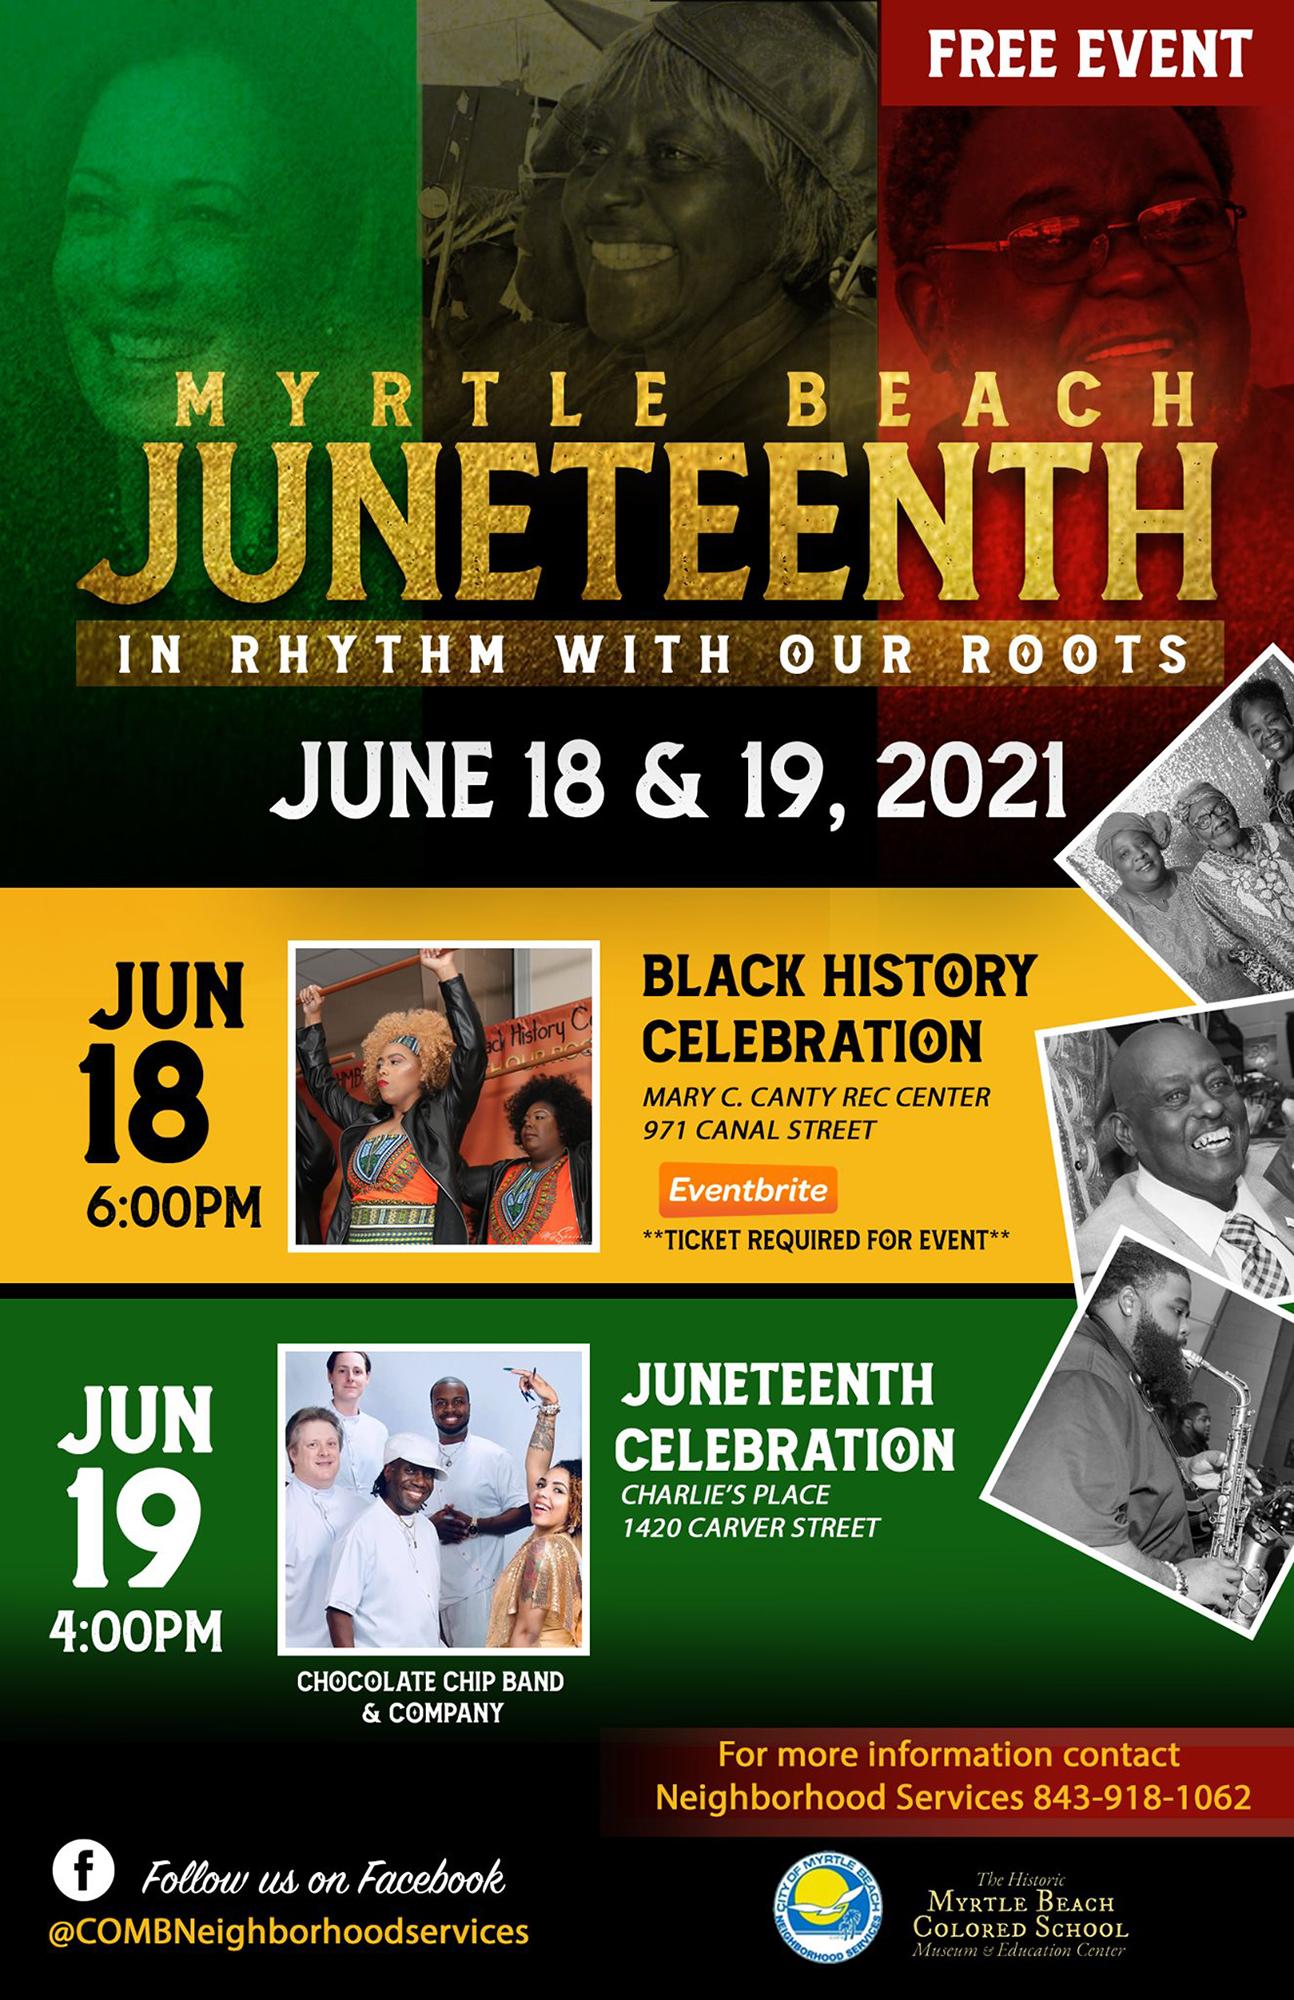 Myrtle Beach Juneteenth and Black History Celebration